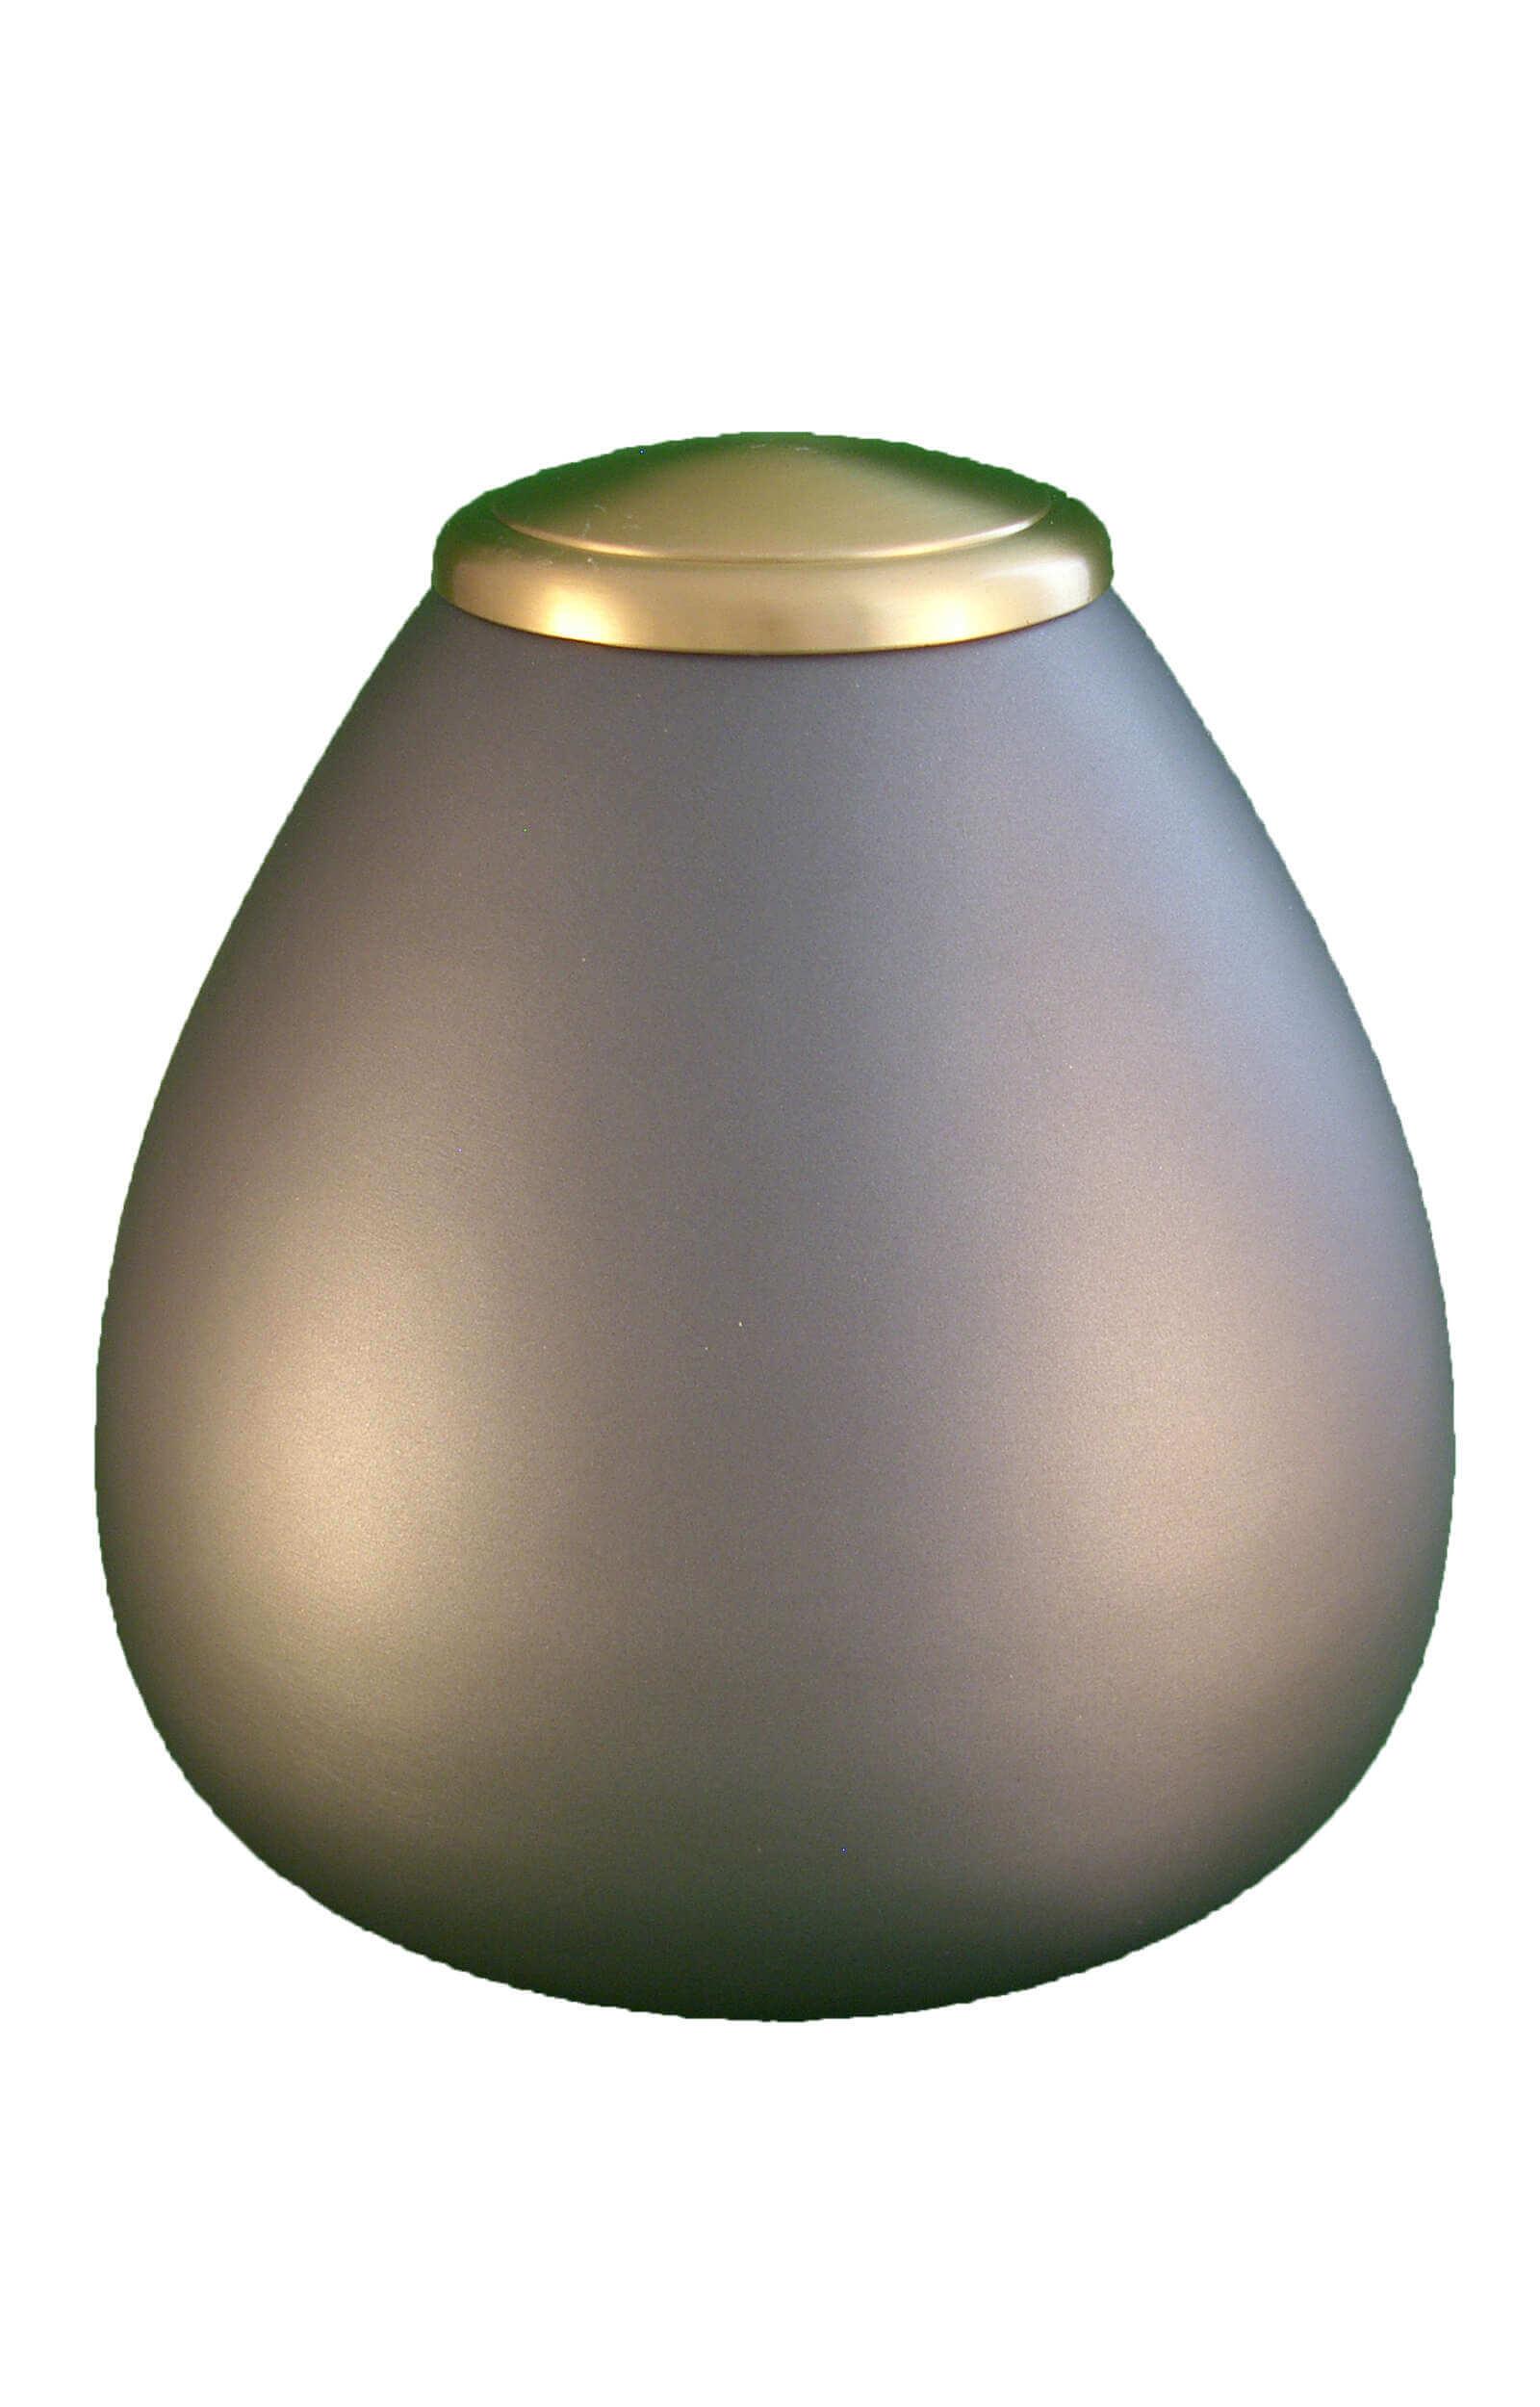 en TIB907 classic grey and gold pet urn jpg